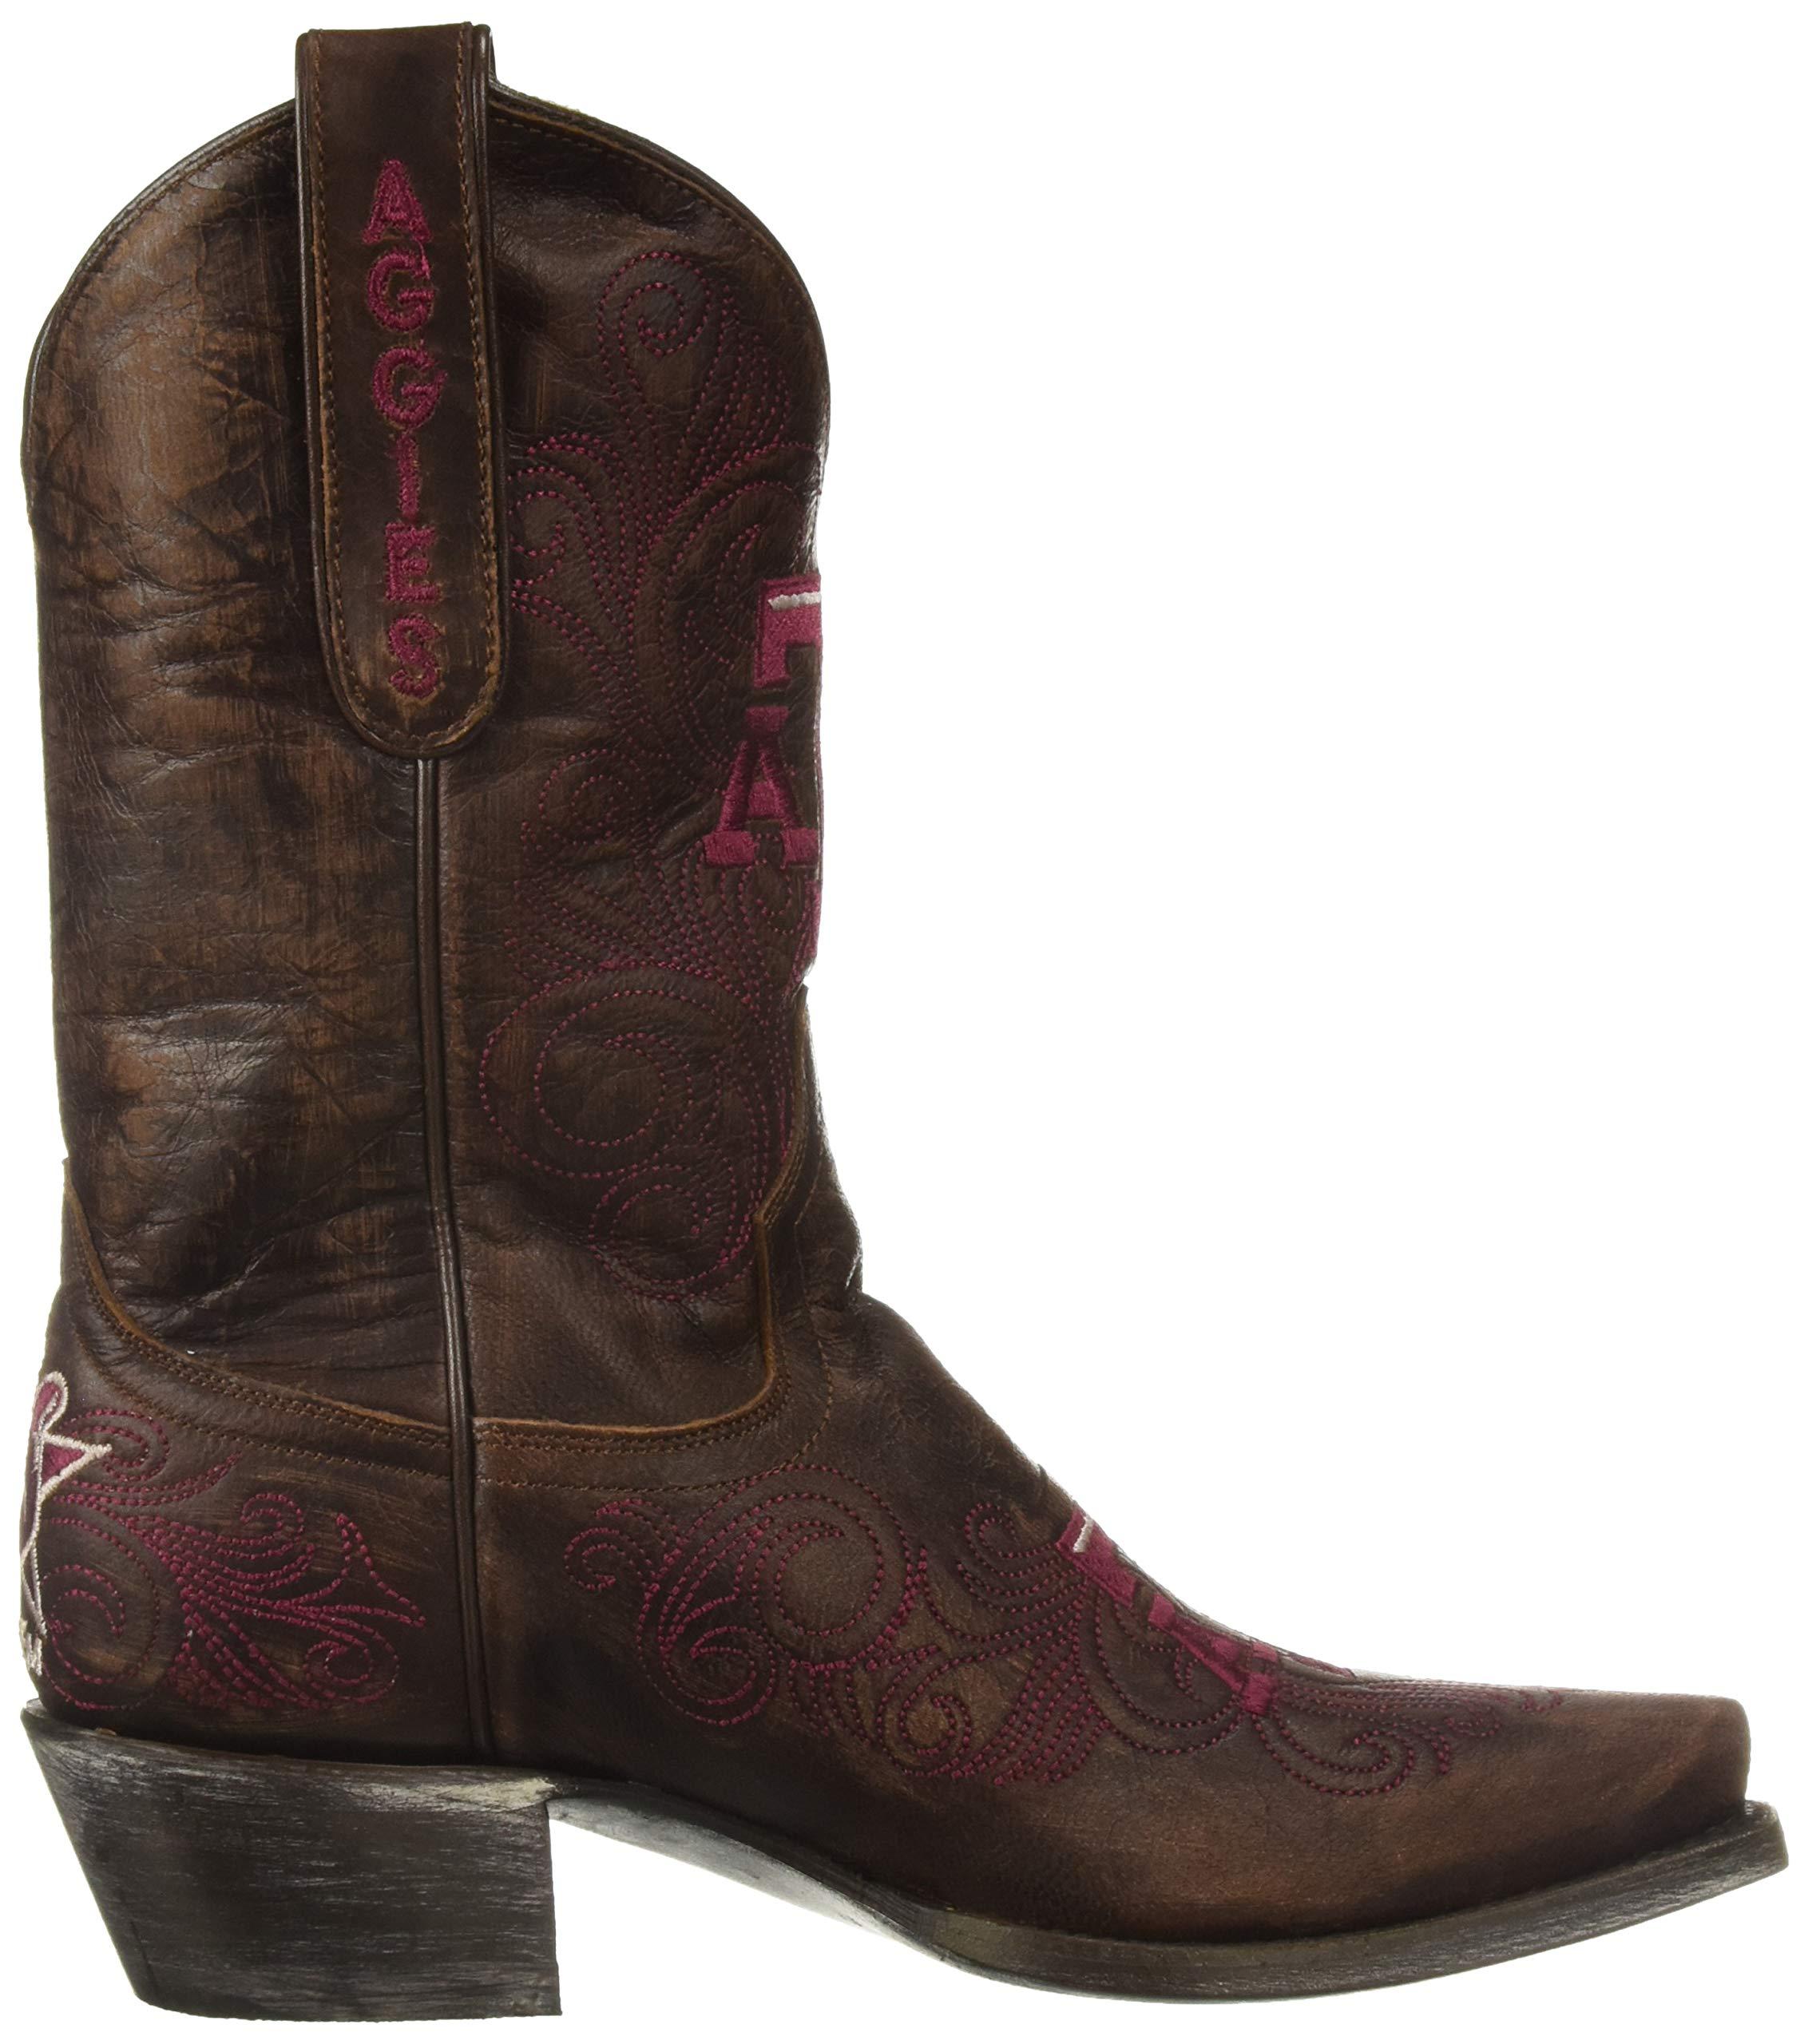 NCAA-Texas-A-amp-M-Aggies-Women-039-s-10-Inch-Gameday-Boot-Choose-SZ-color miniature 8